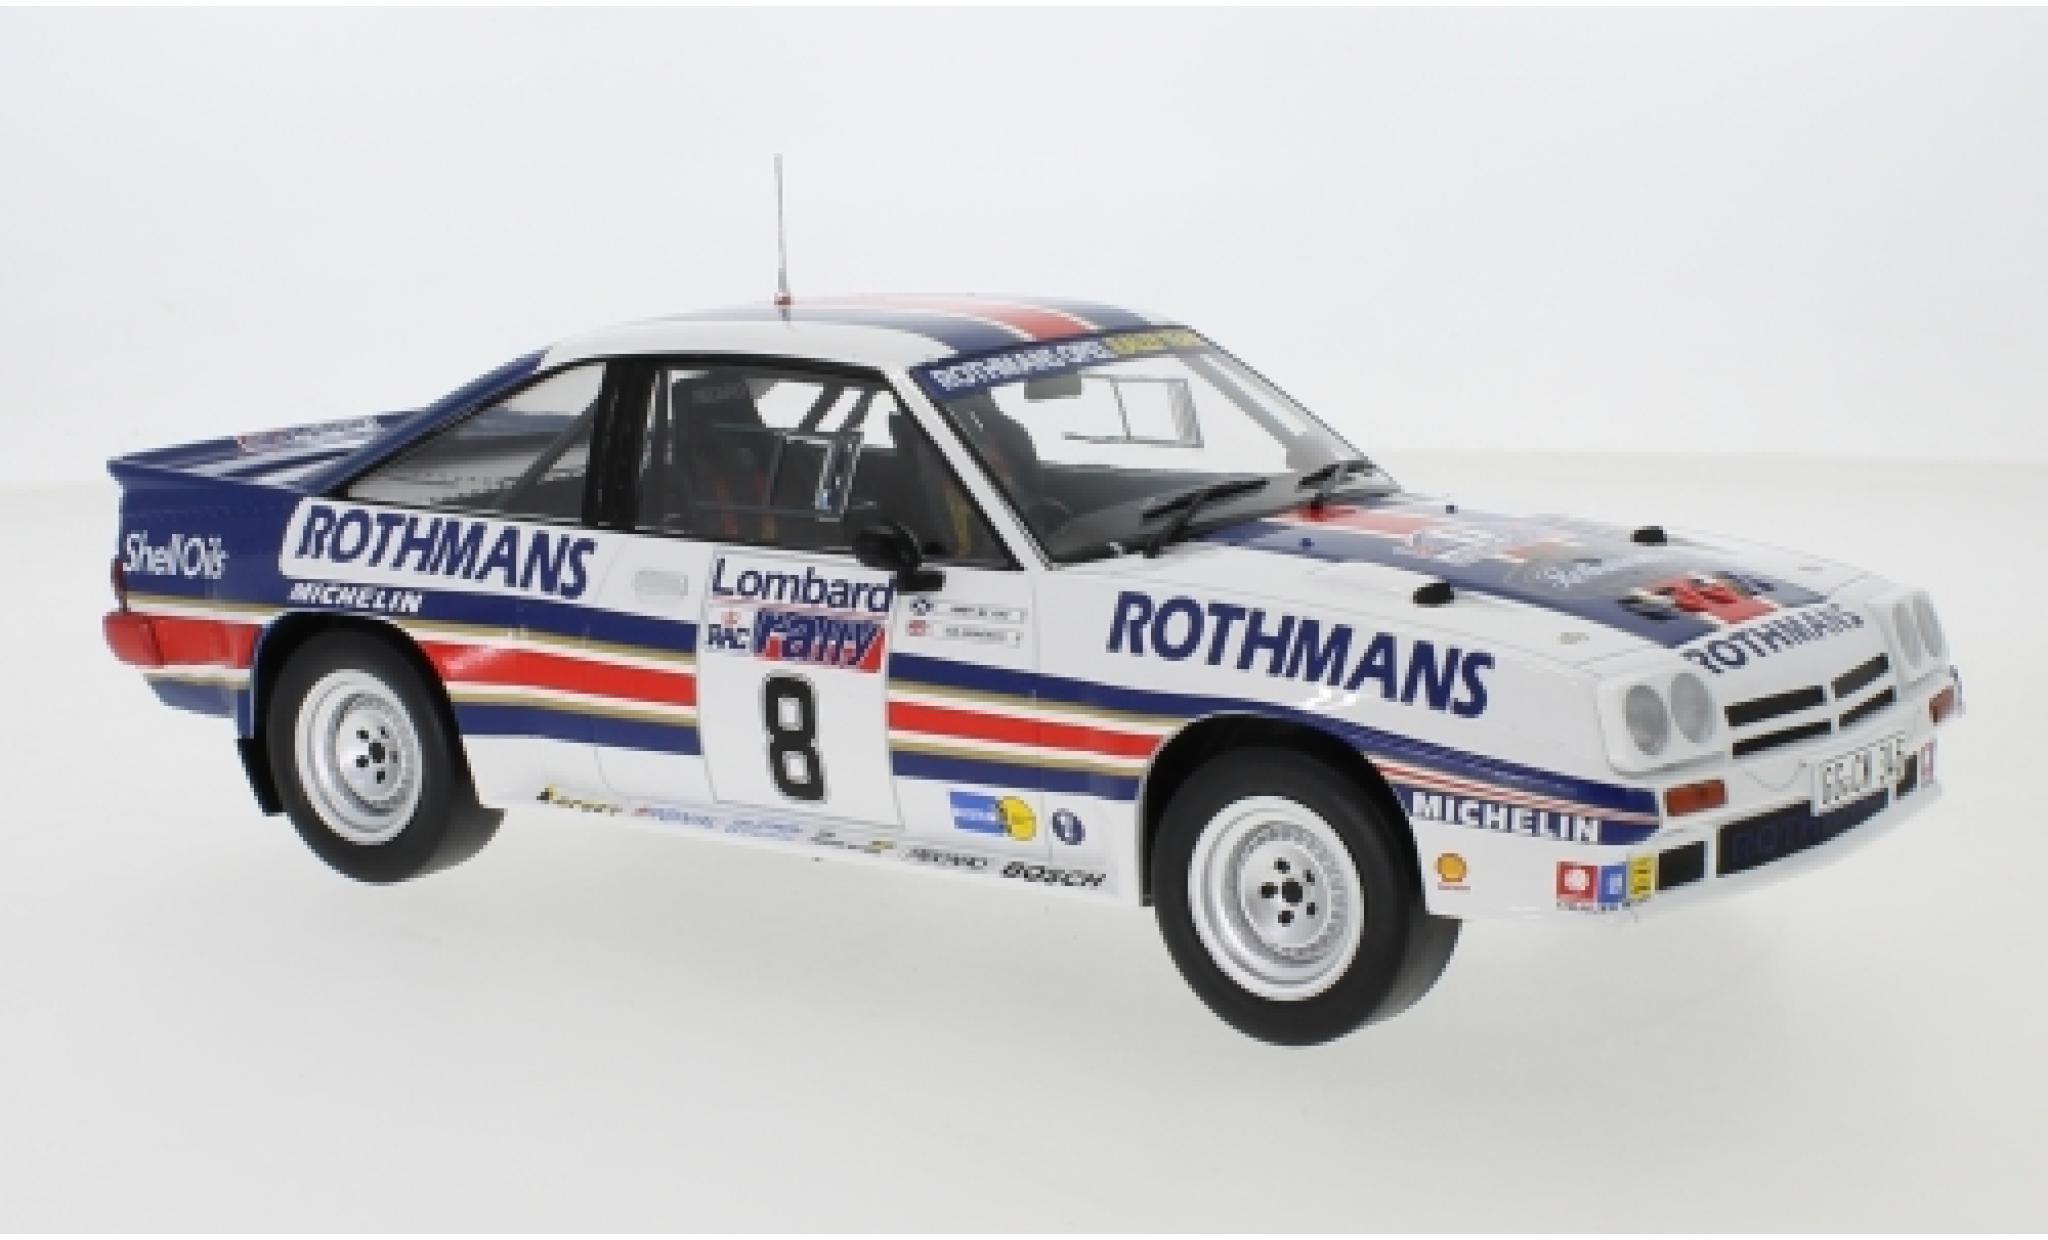 Opel Manta 1/18 IXO 400 No.8 Rothmans Rally Team Rothmans Rallye WM RAC Rallye 1983 J.McRae/I.Grindrod